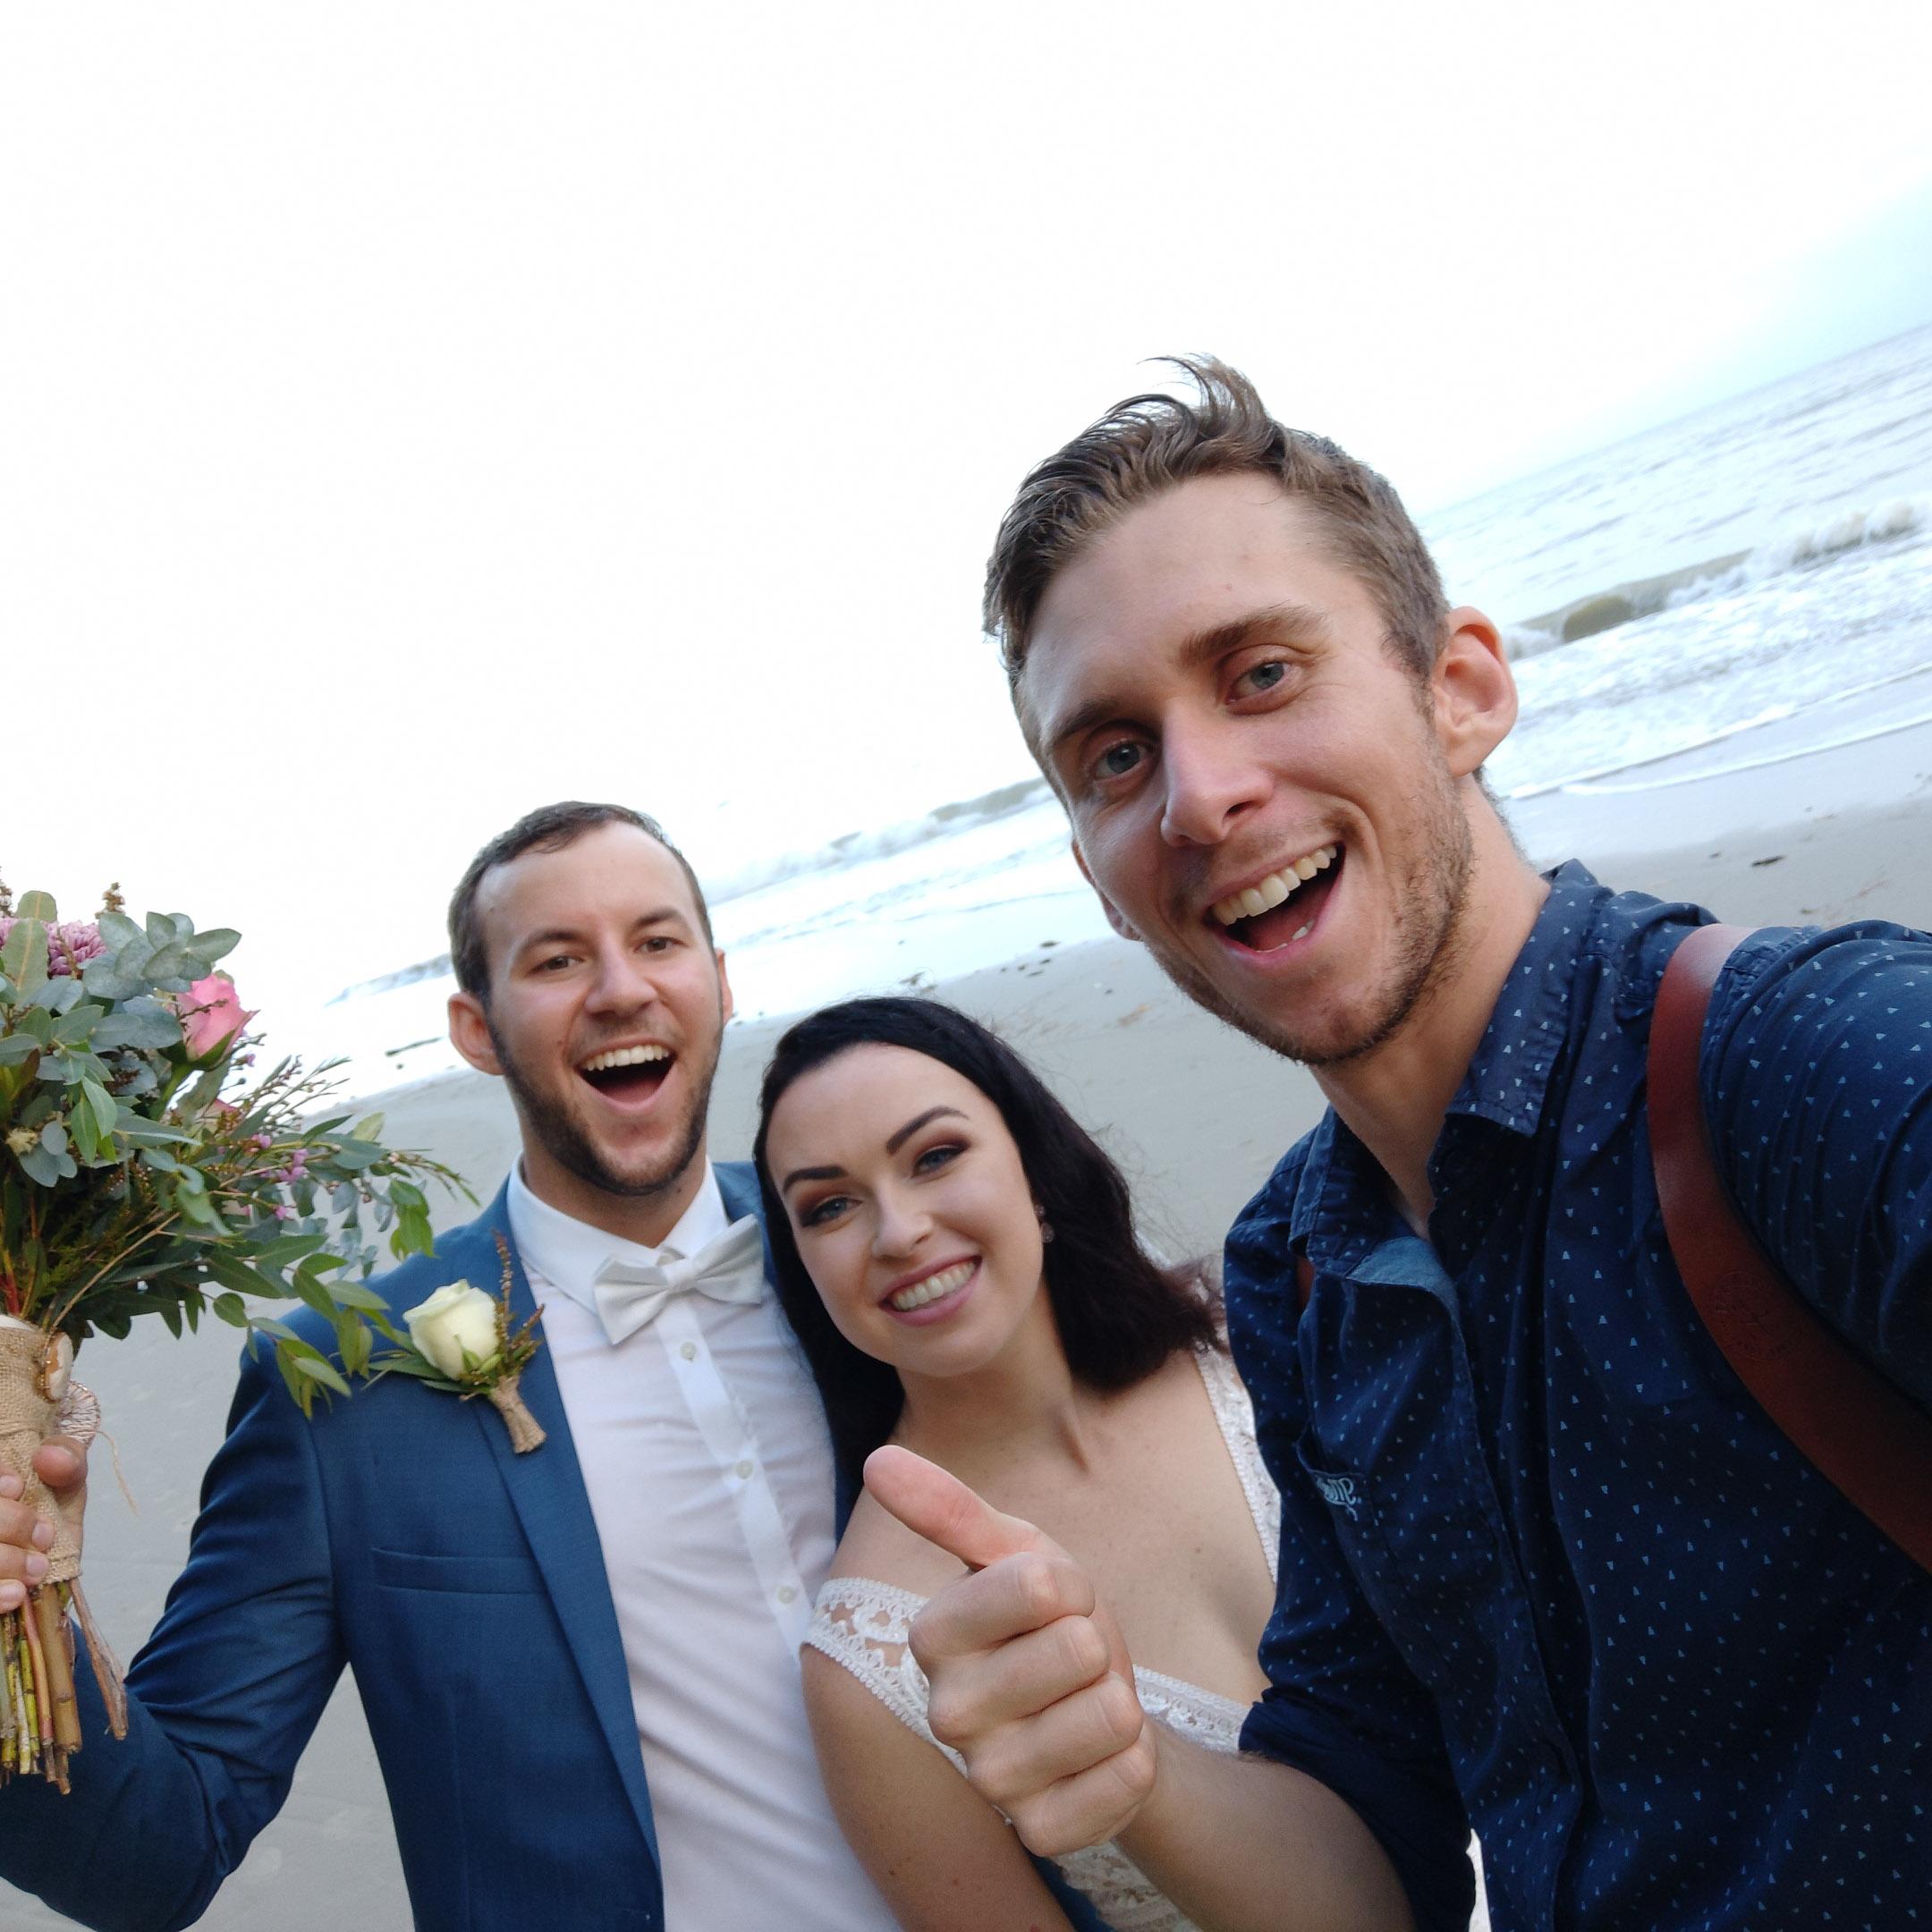 The-raw-photographer-cairns-wedding-photography-bridalparty-selfie-5.jpg